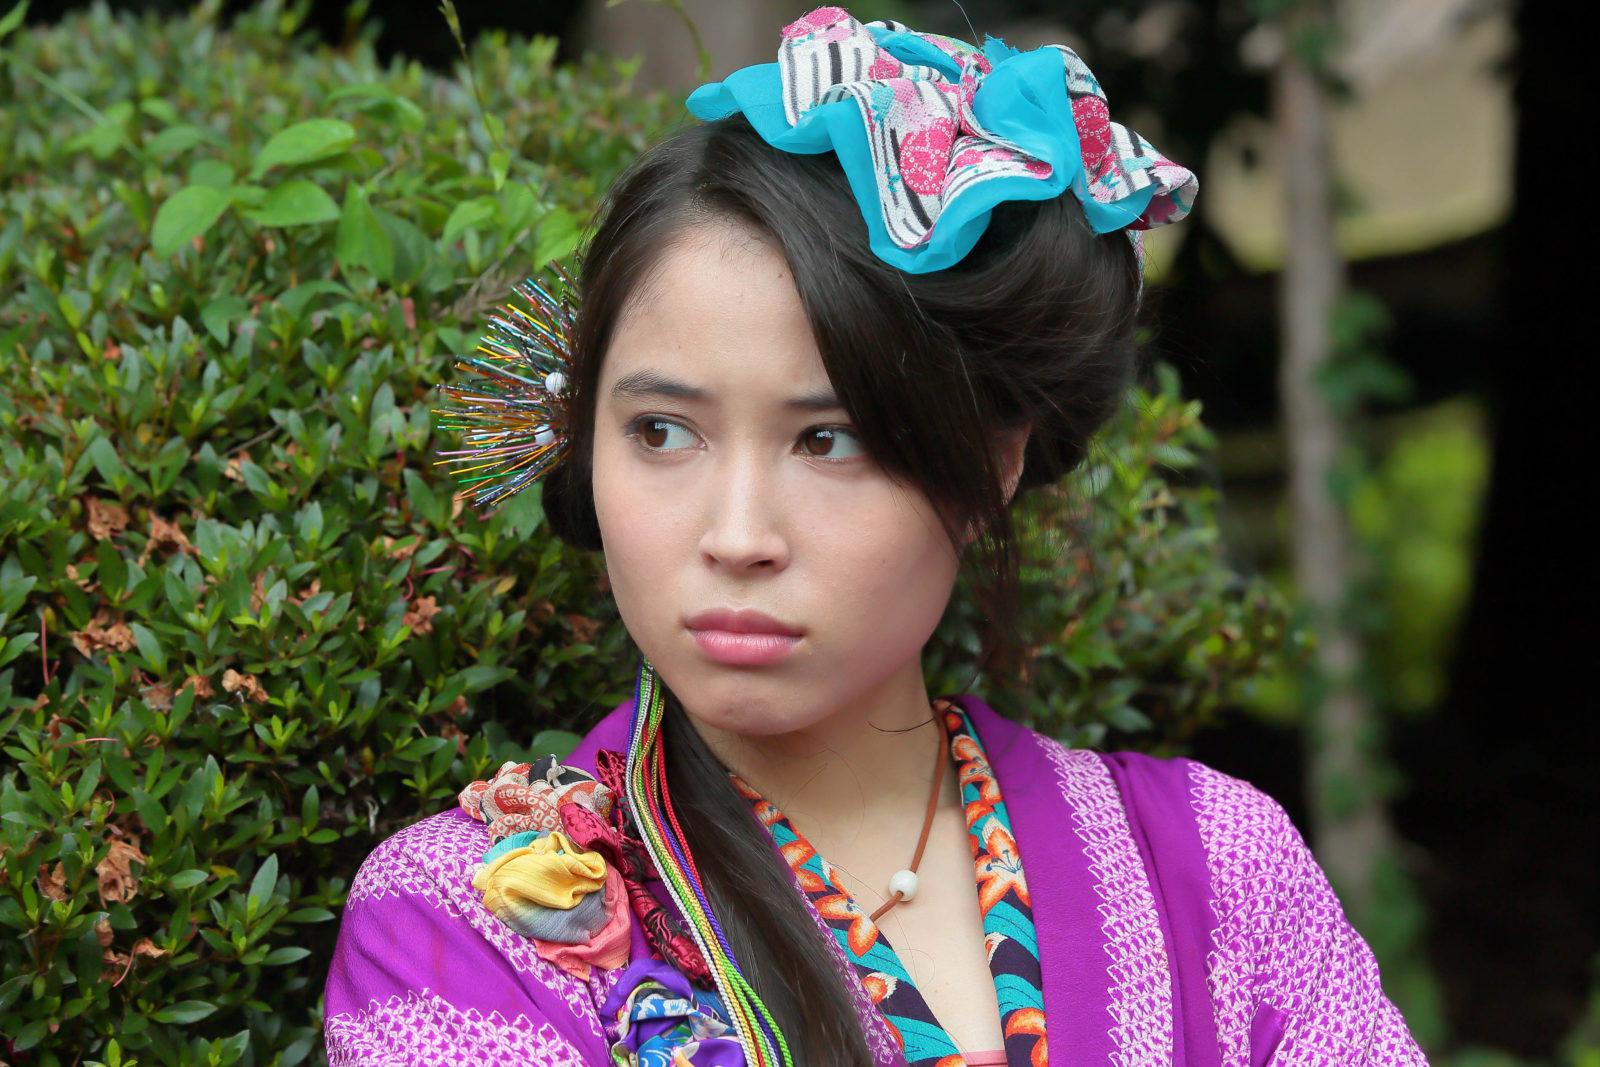 NHK連続テレビ小説「わろてんか」広瀬アリス演じる恋敵?リリコの登場にネットでは絶賛の声サムネイル画像